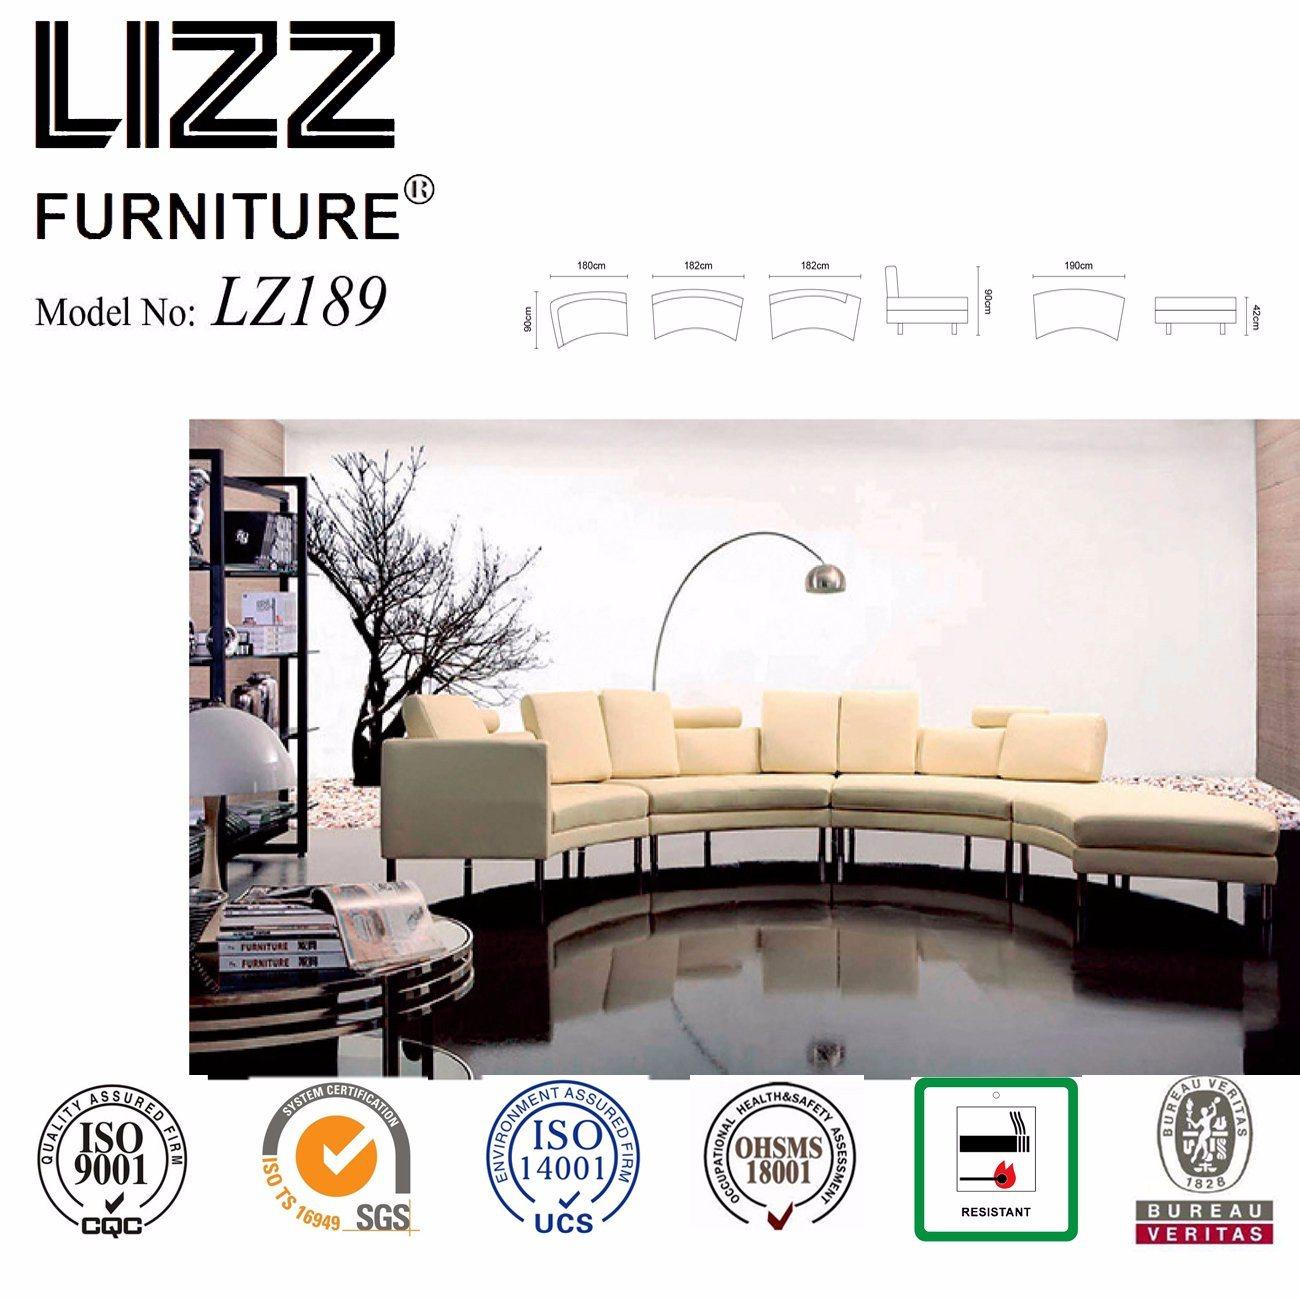 Hot Item Curved Design Modular Sofa 8 Seater